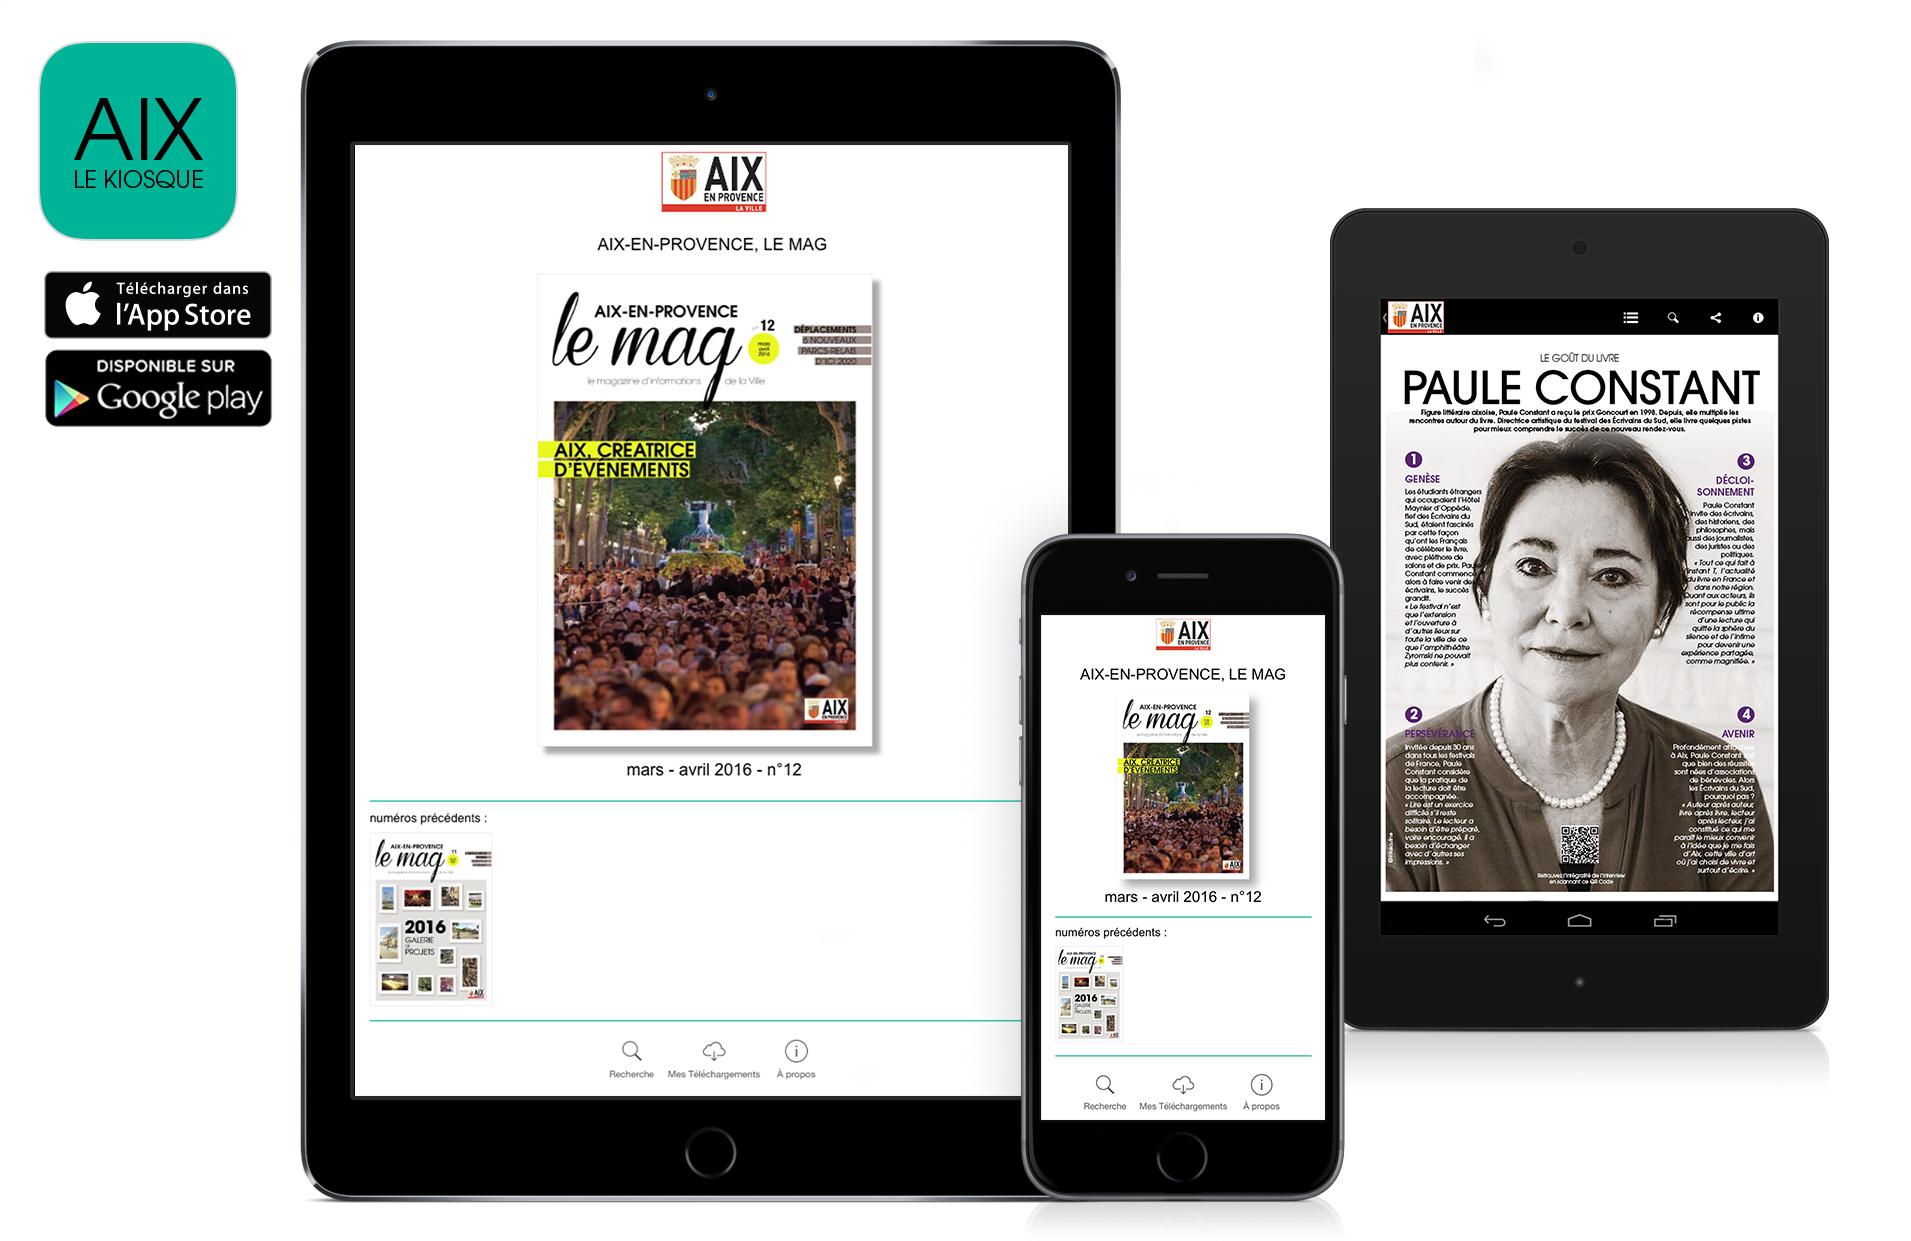 appli aix en provence le mag sur ipad iphone et android flippad digitalisation catalogues. Black Bedroom Furniture Sets. Home Design Ideas